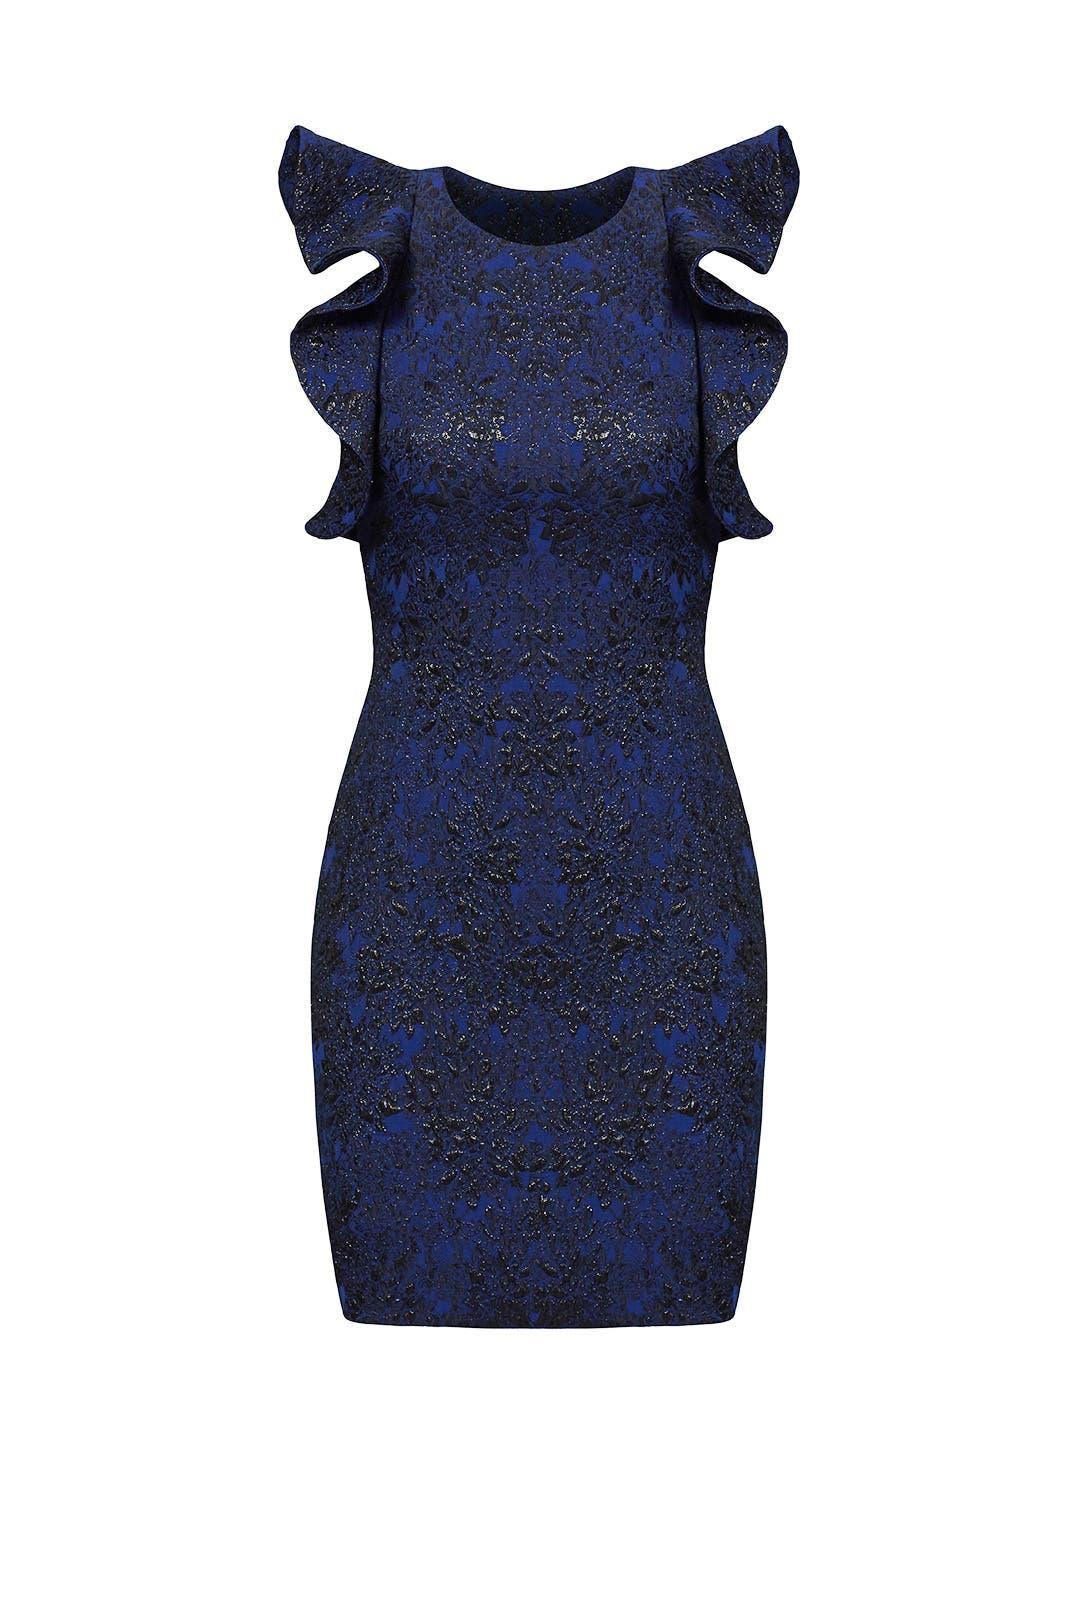 Blue Ruffle Splatter Dress by Parker for $50 - $60 | Rent the Runway